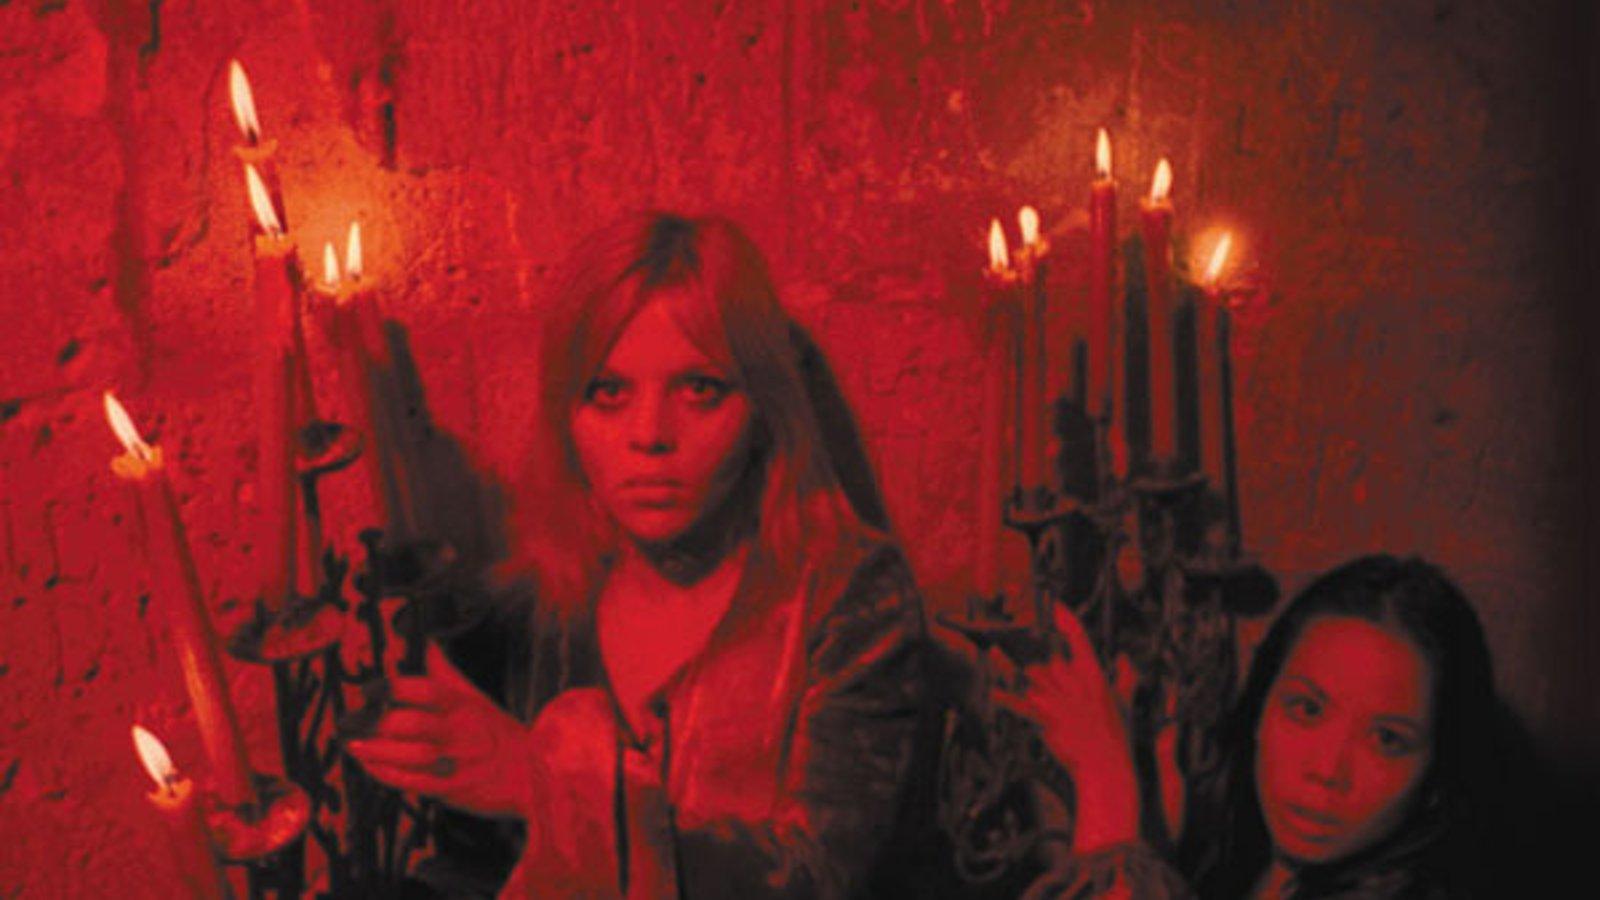 The Shiver Of The Vampire - Le Frisson Des Vampires